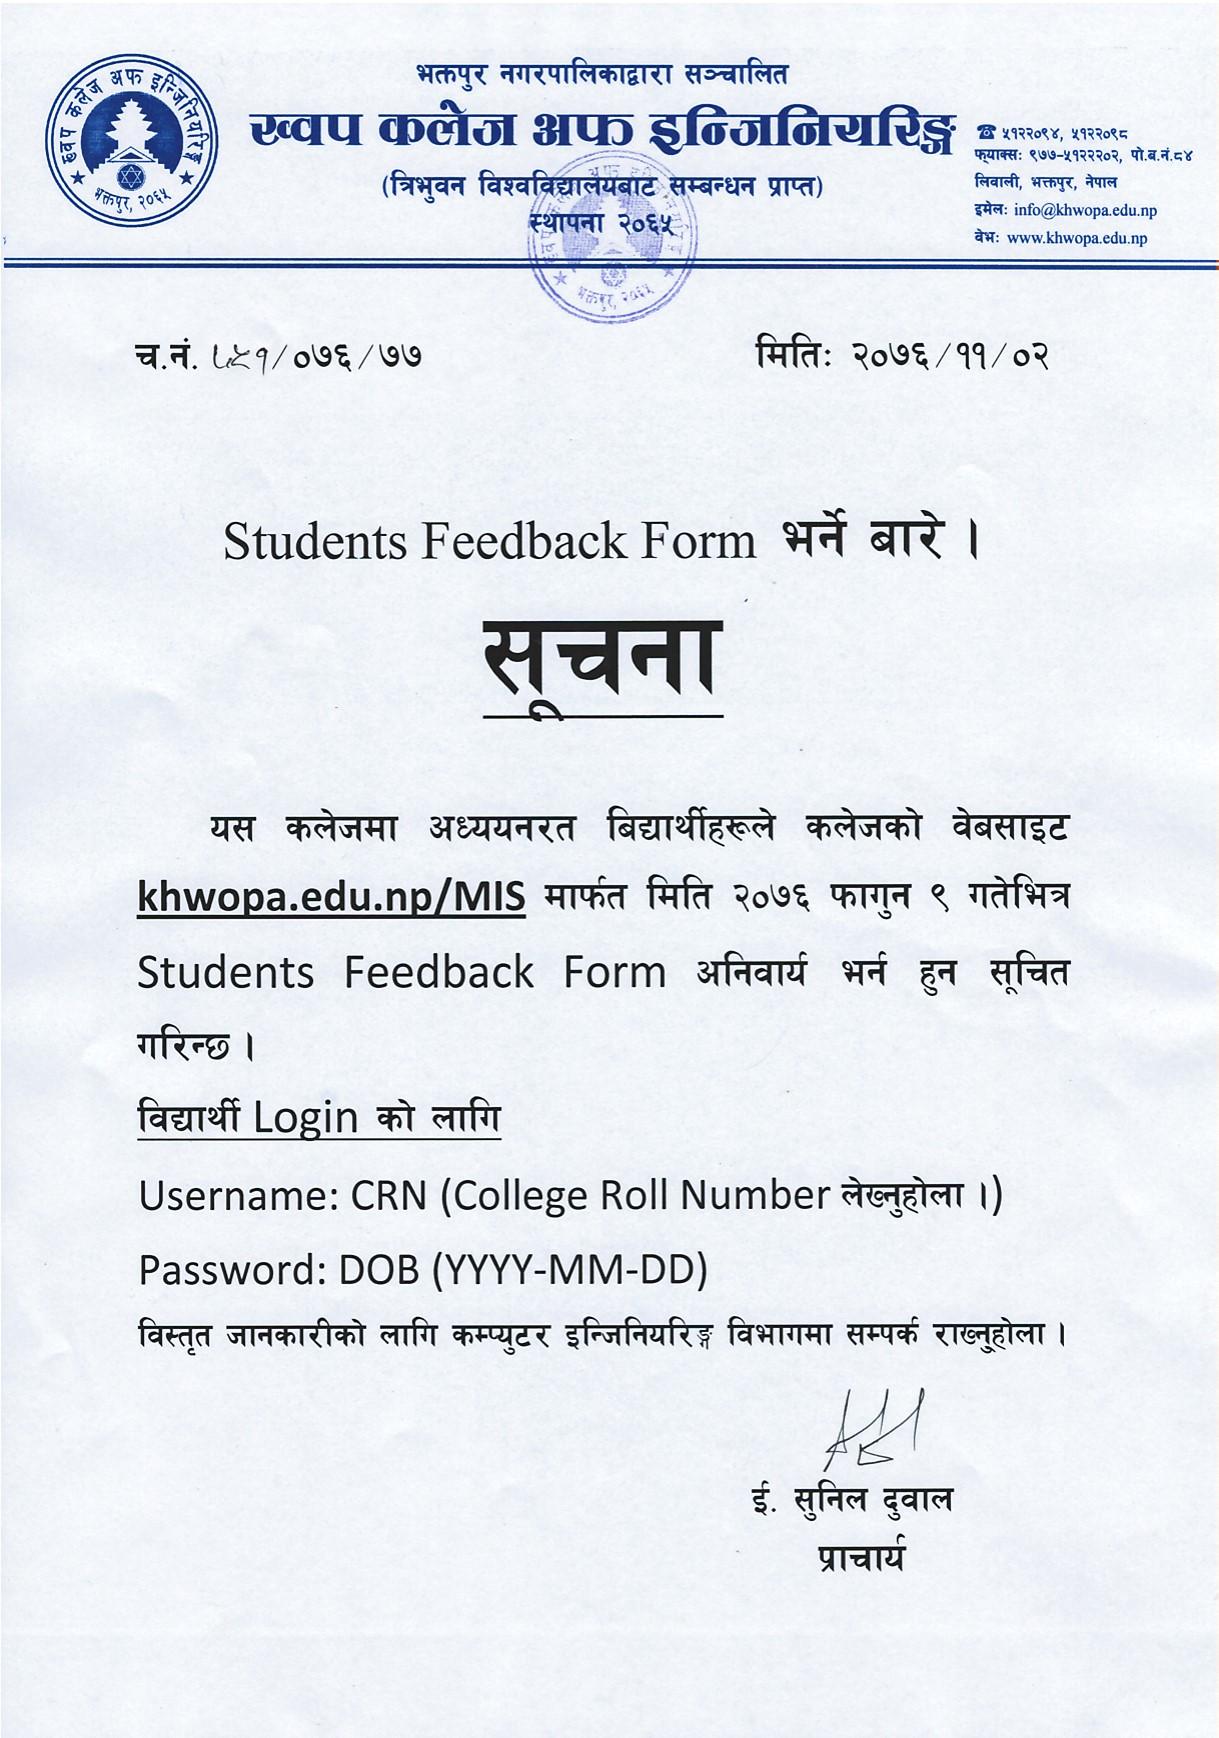 Students Feedback Form भर्ने बारे सूचना !